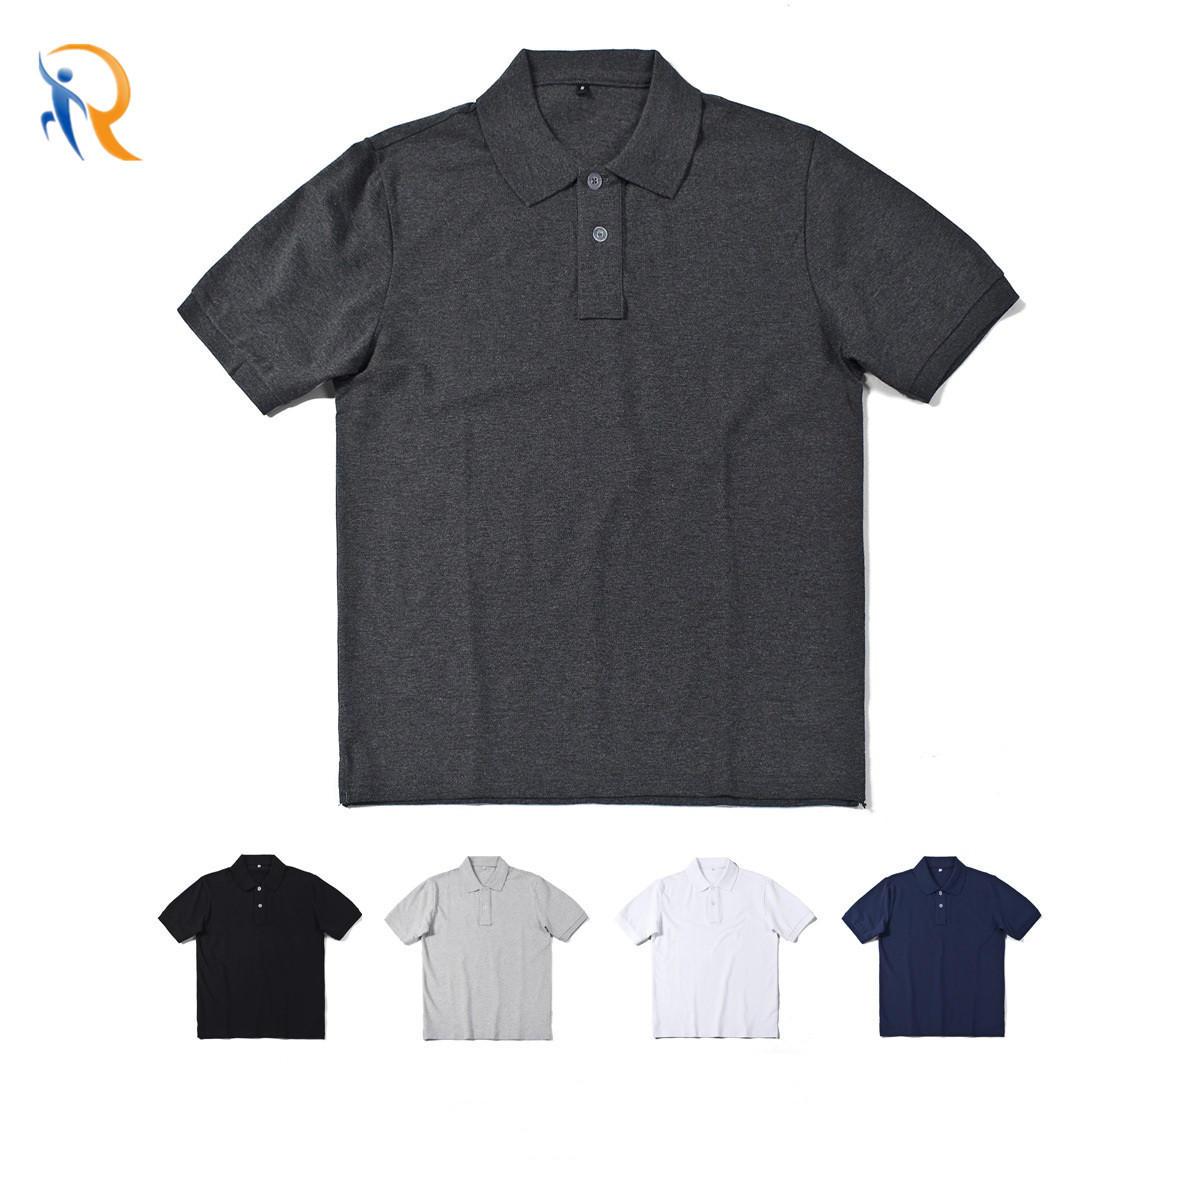 Organic Cotton Basic Polo Shirt Retro Solid Color Short-Sleeved Lapel Polo Shirt Men′s Half-Sleeved Plain T-Shirt